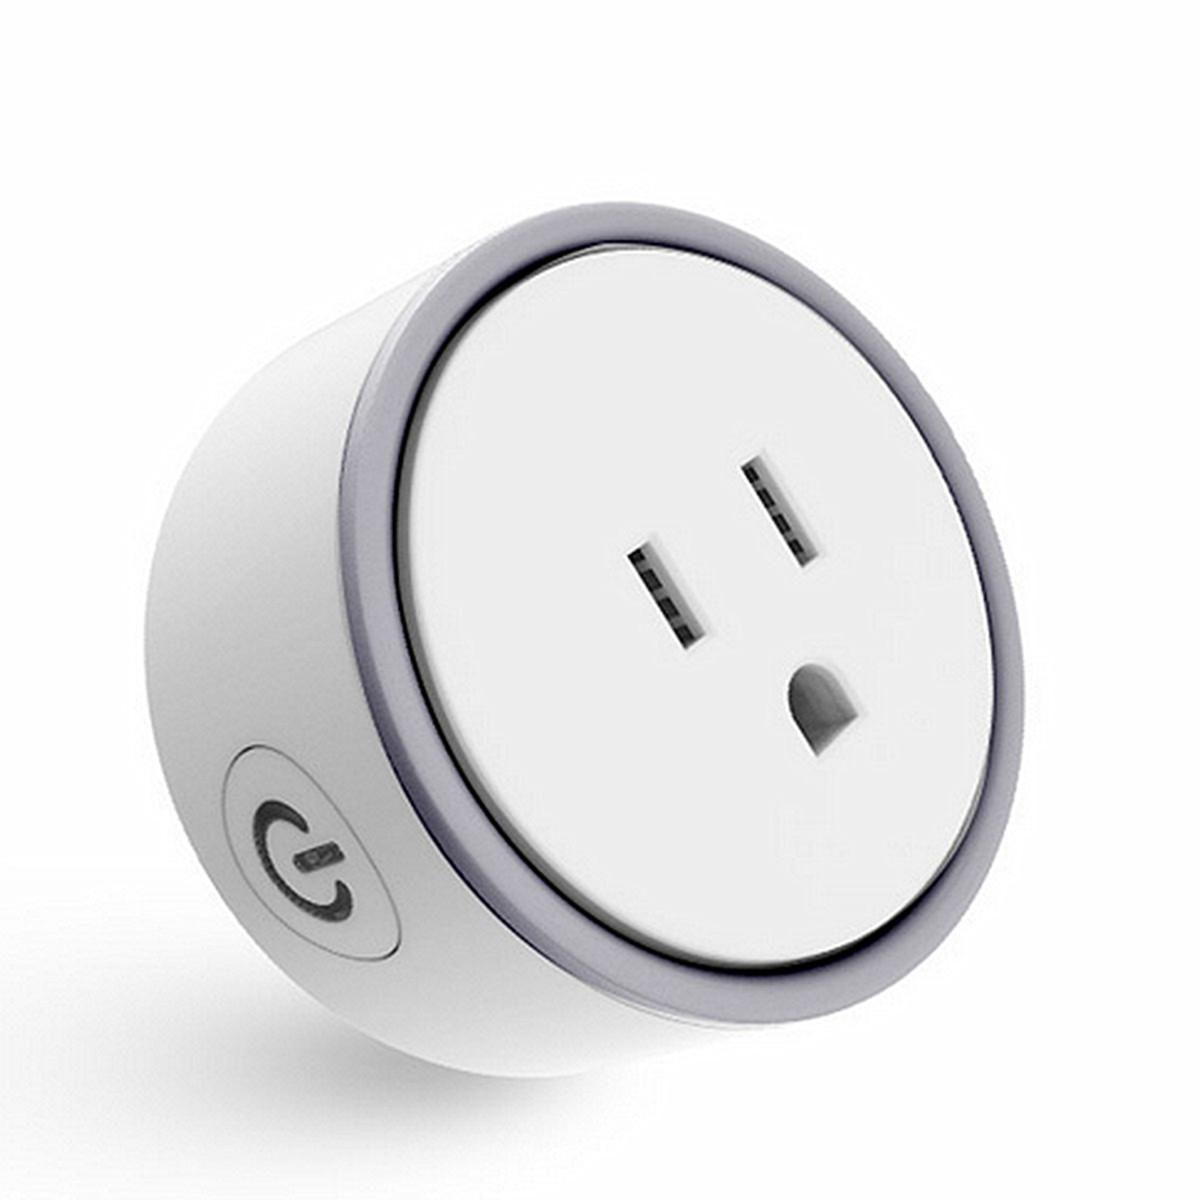 mini smart wifi socket remote control switch power socket. Black Bedroom Furniture Sets. Home Design Ideas